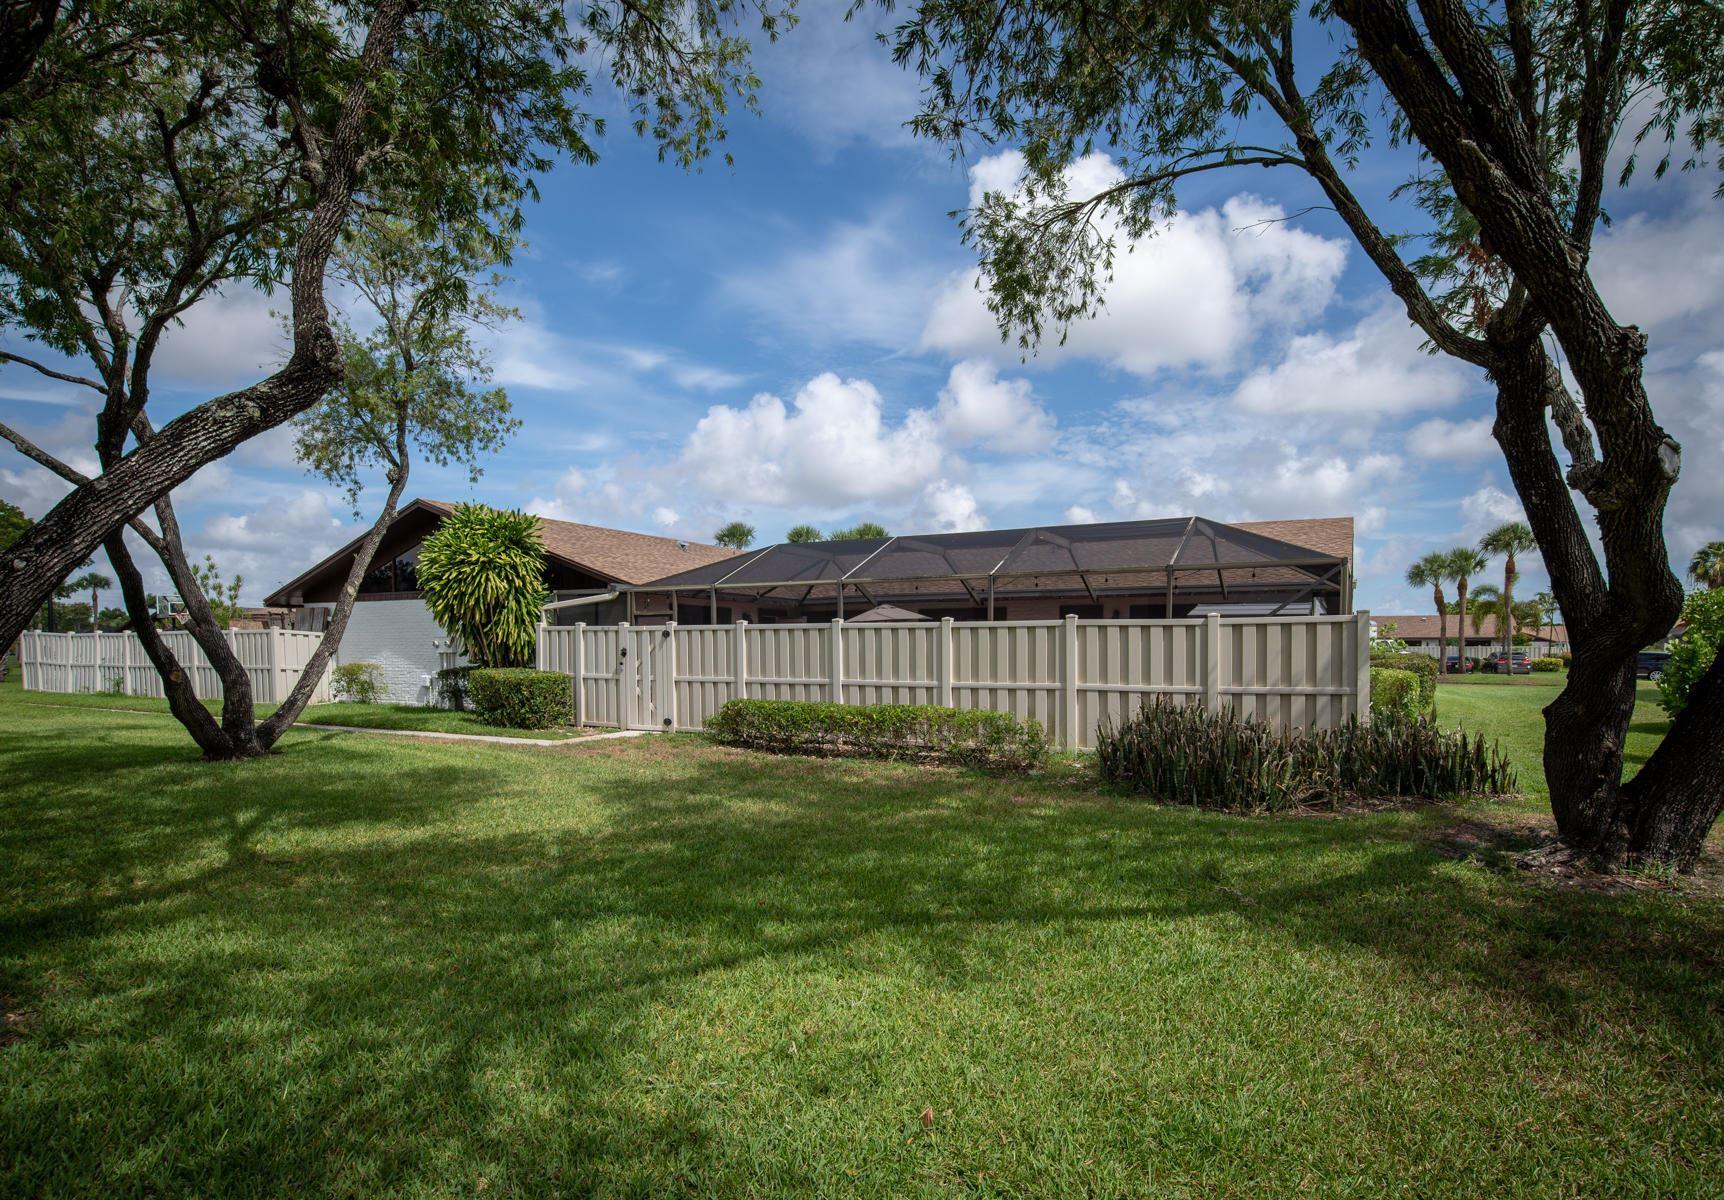 9854 Boca Gardens Trail #C, Boca Raton, FL 33496 - MLS#: RX-10723113